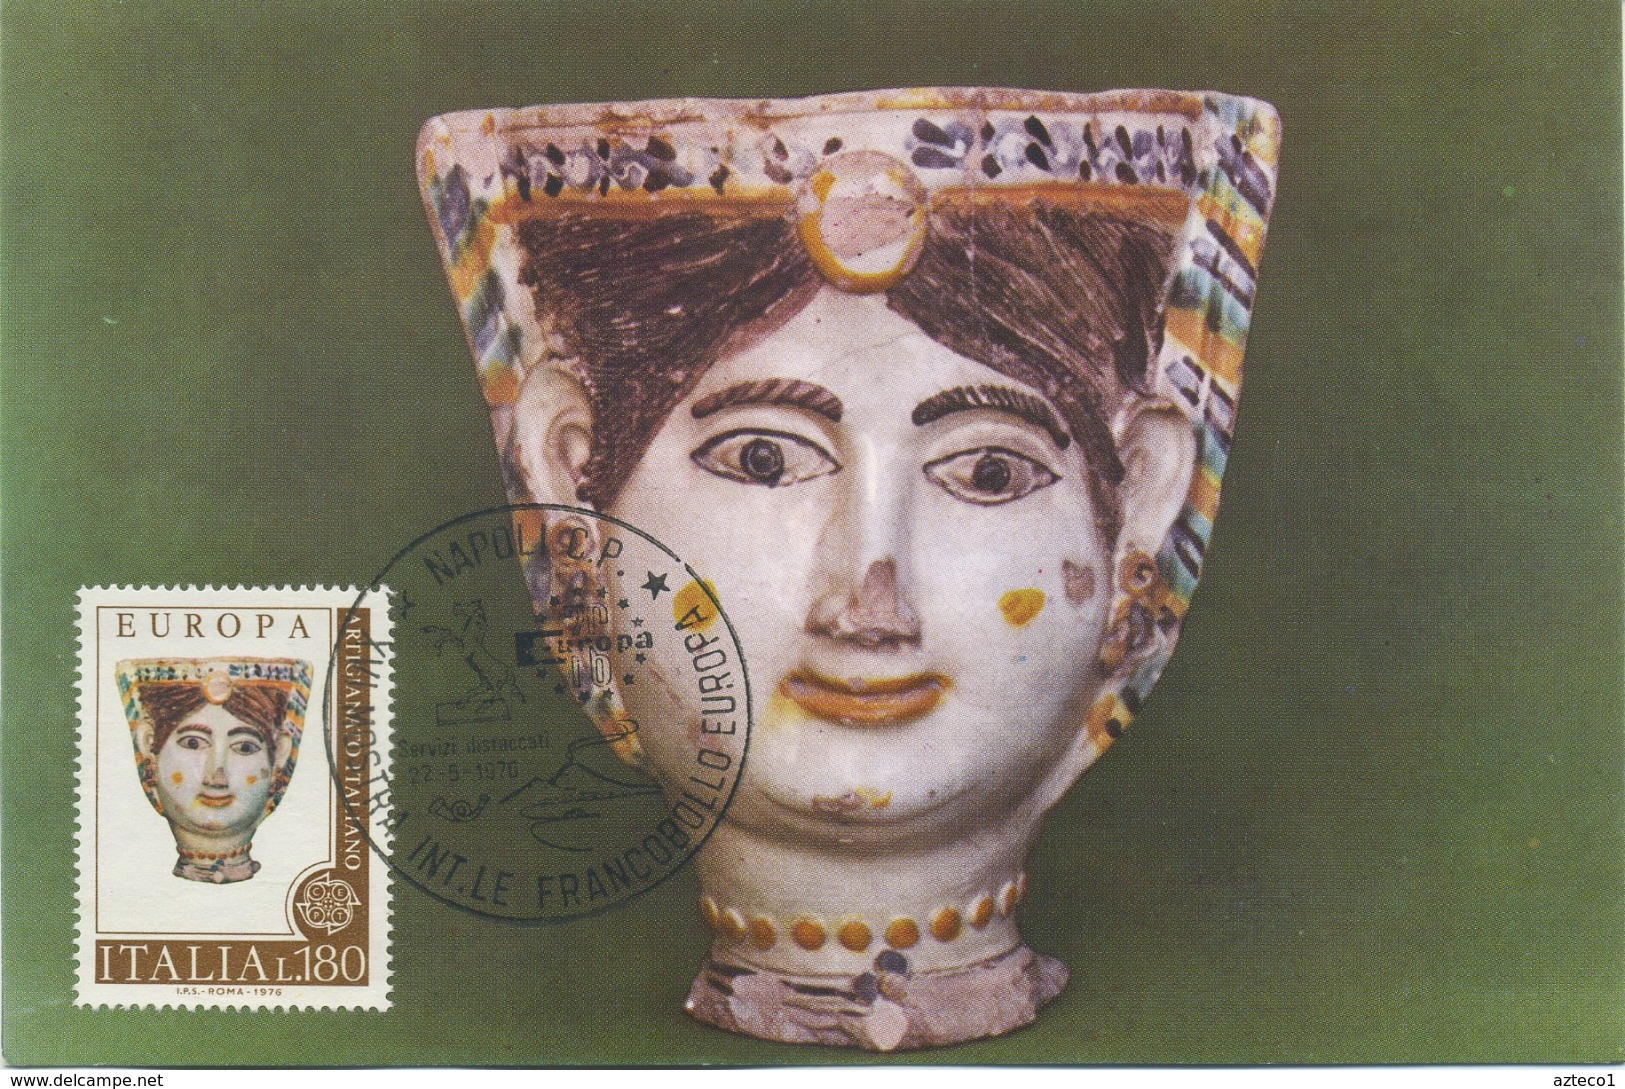 ITALIA - FDC MAXIMUM CARD 1976 - EUROPA UNITA - VASO DA FIORI IN CERAMICA - ARTE - ANNULLO SPECIALE - Cartoline Maximum